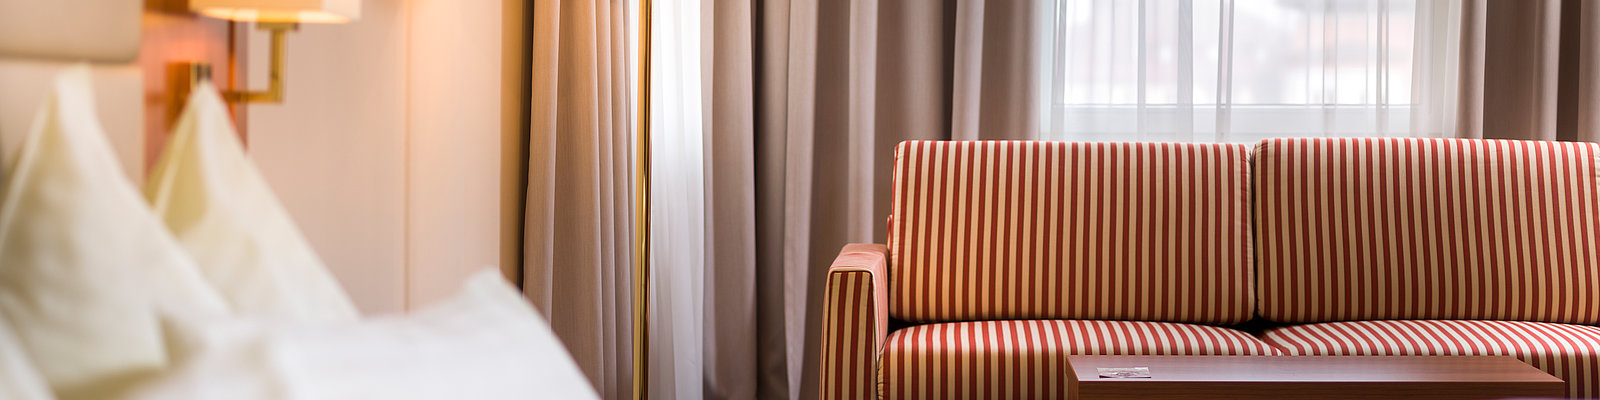 ruhiges Zimmer - Traube Exklusiv ©Martin Lugger